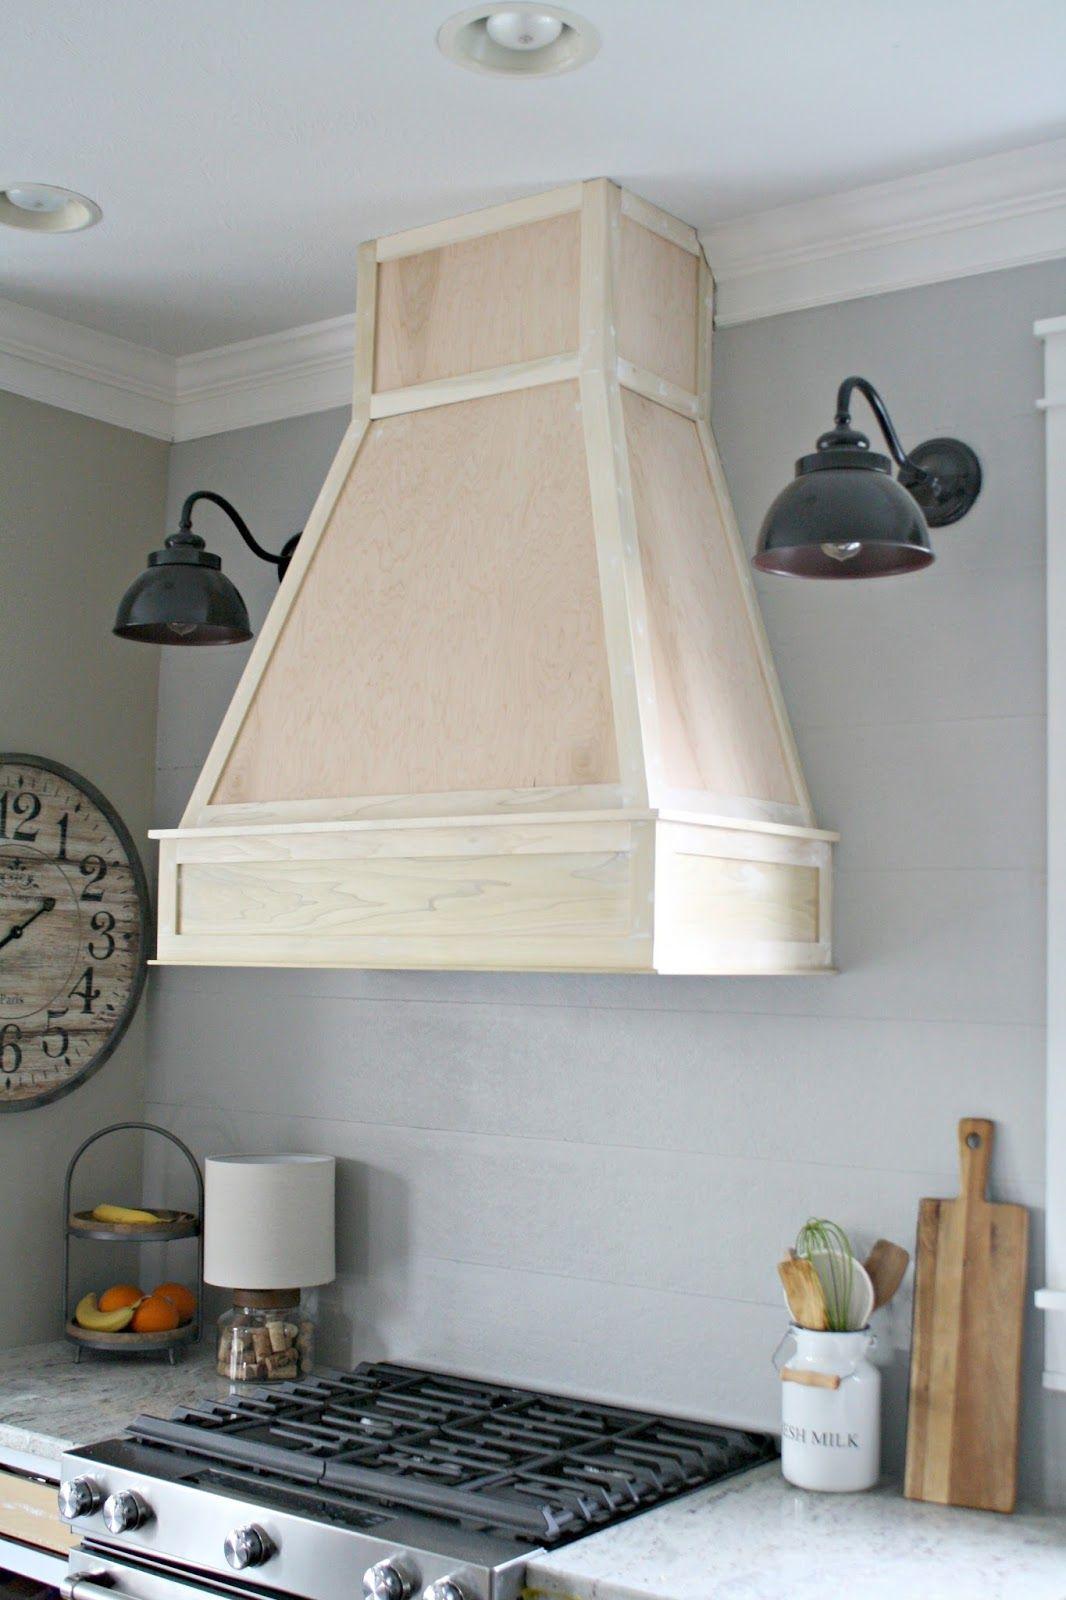 A Diy Ish Wood Vent Hood Interieur Huisdecoratie Tuinkamer